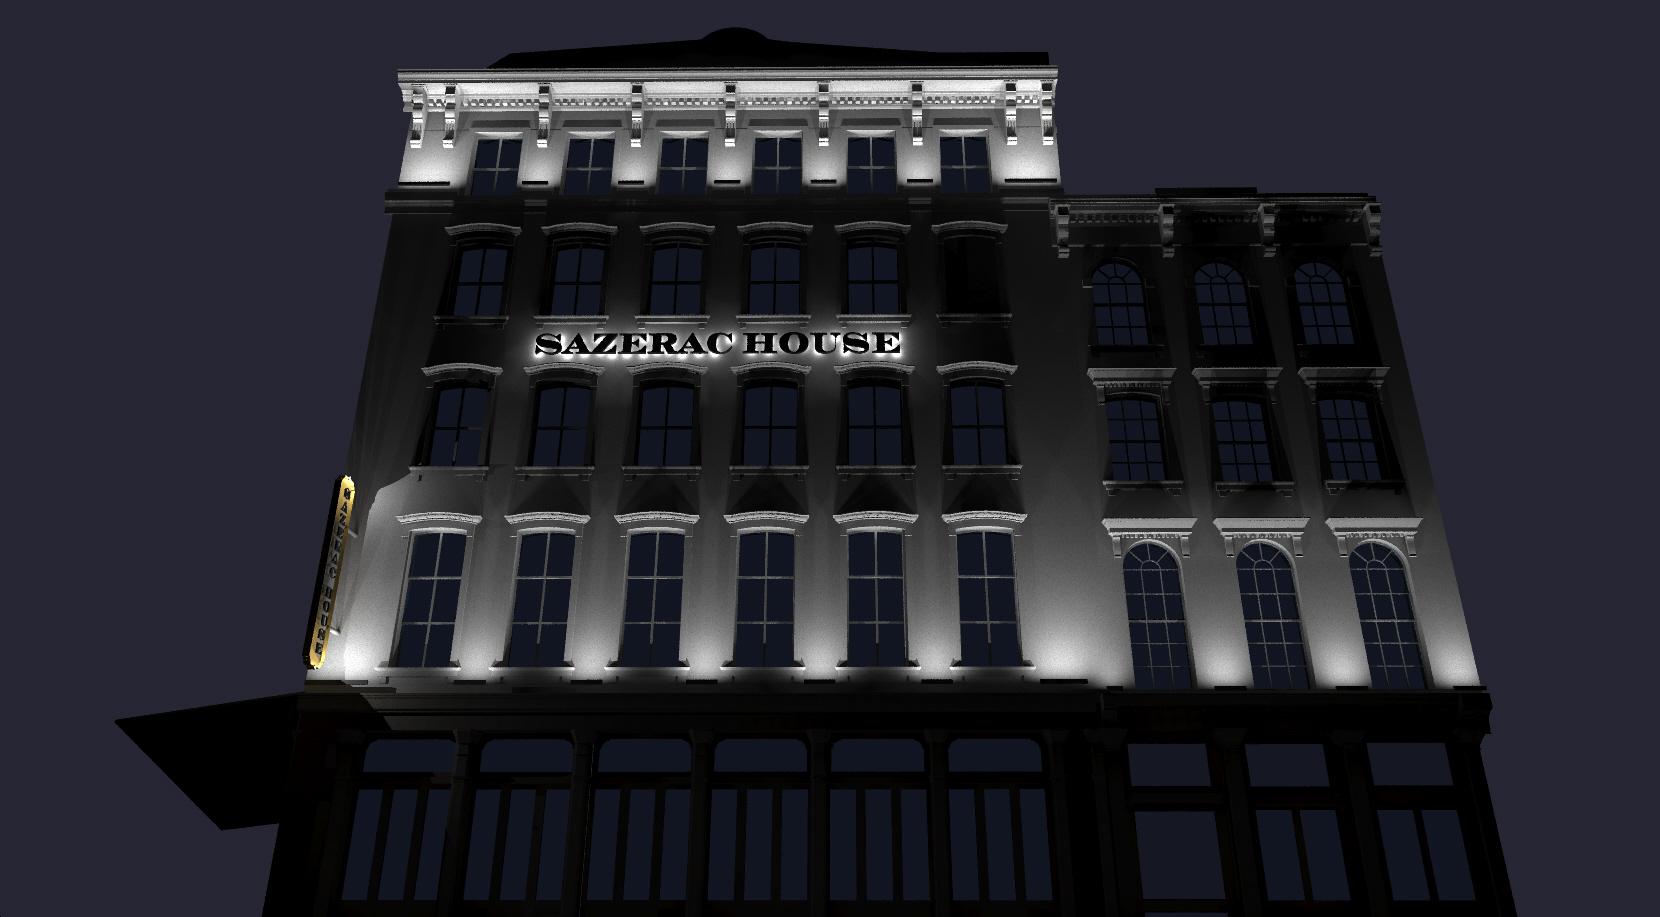 Sazerac House Exterior Lighting Rendering